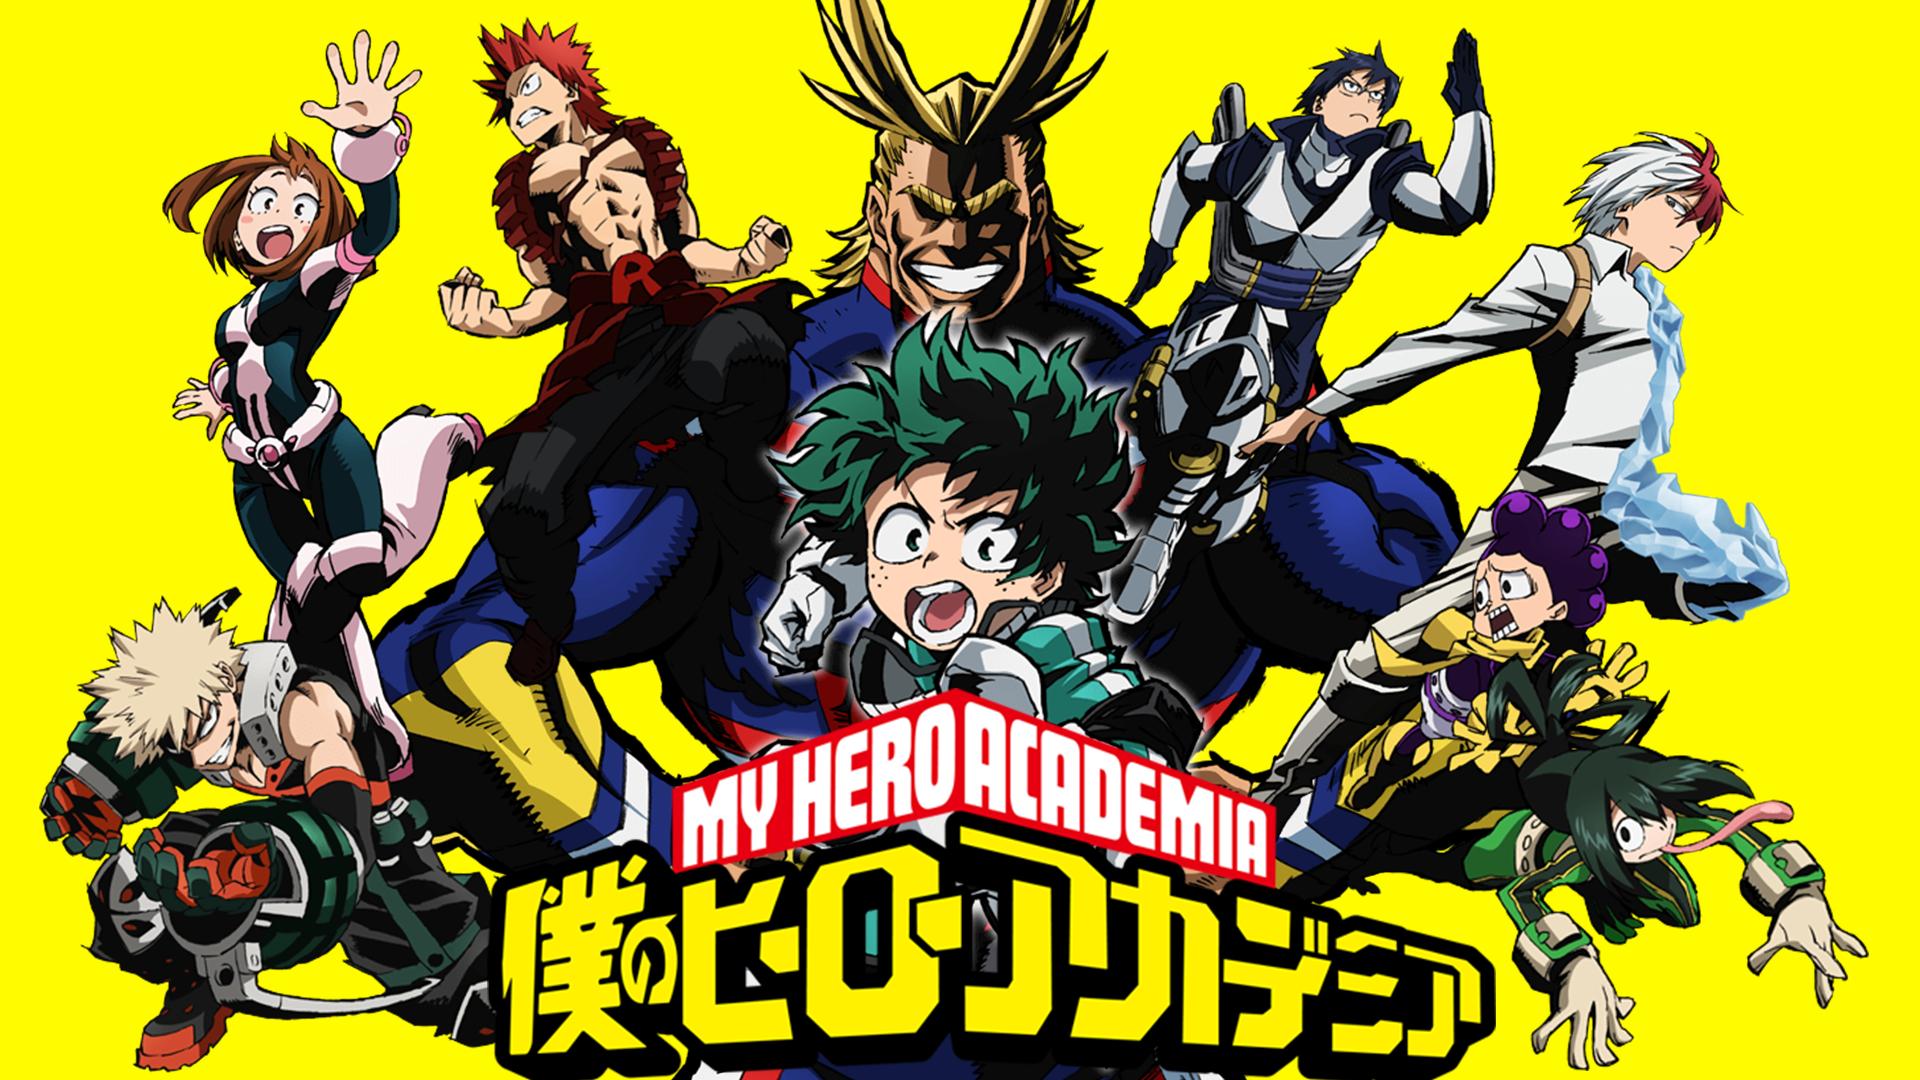 My Hero Academia Wallpaper By Animecitationsquotes On Deviantart